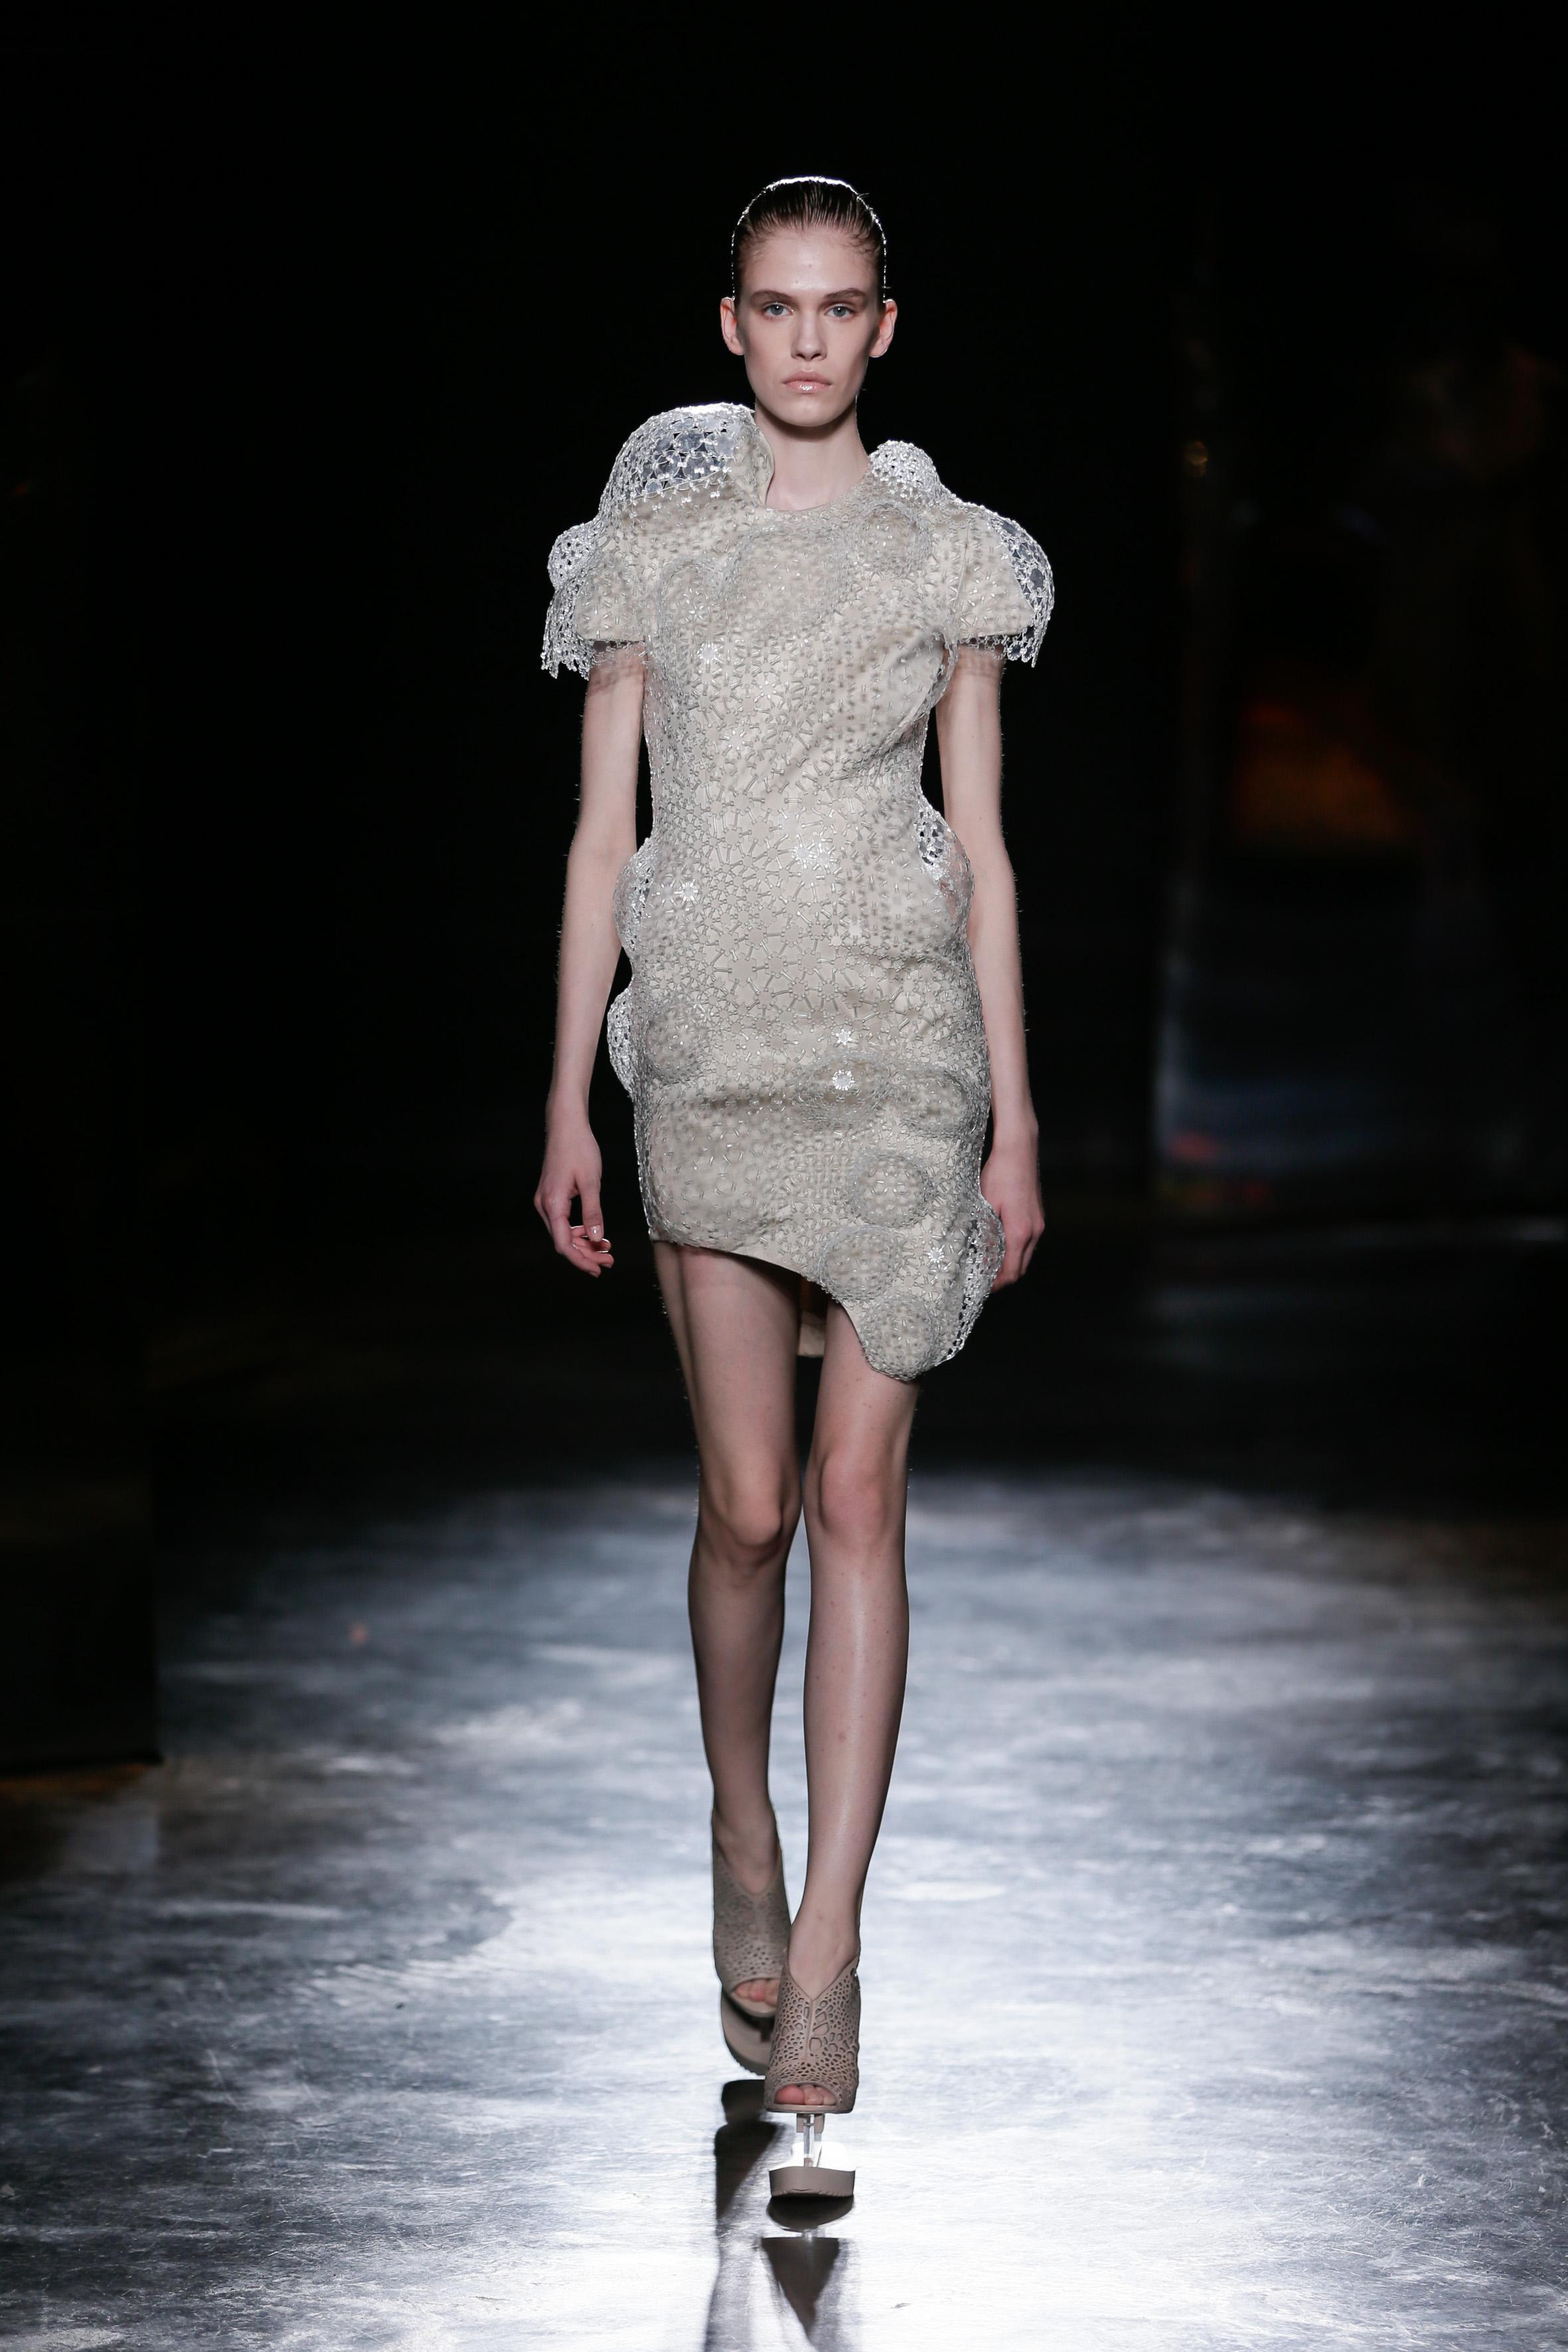 Iris van Herpen Catwalk Fashion Show Womenswear FW2016